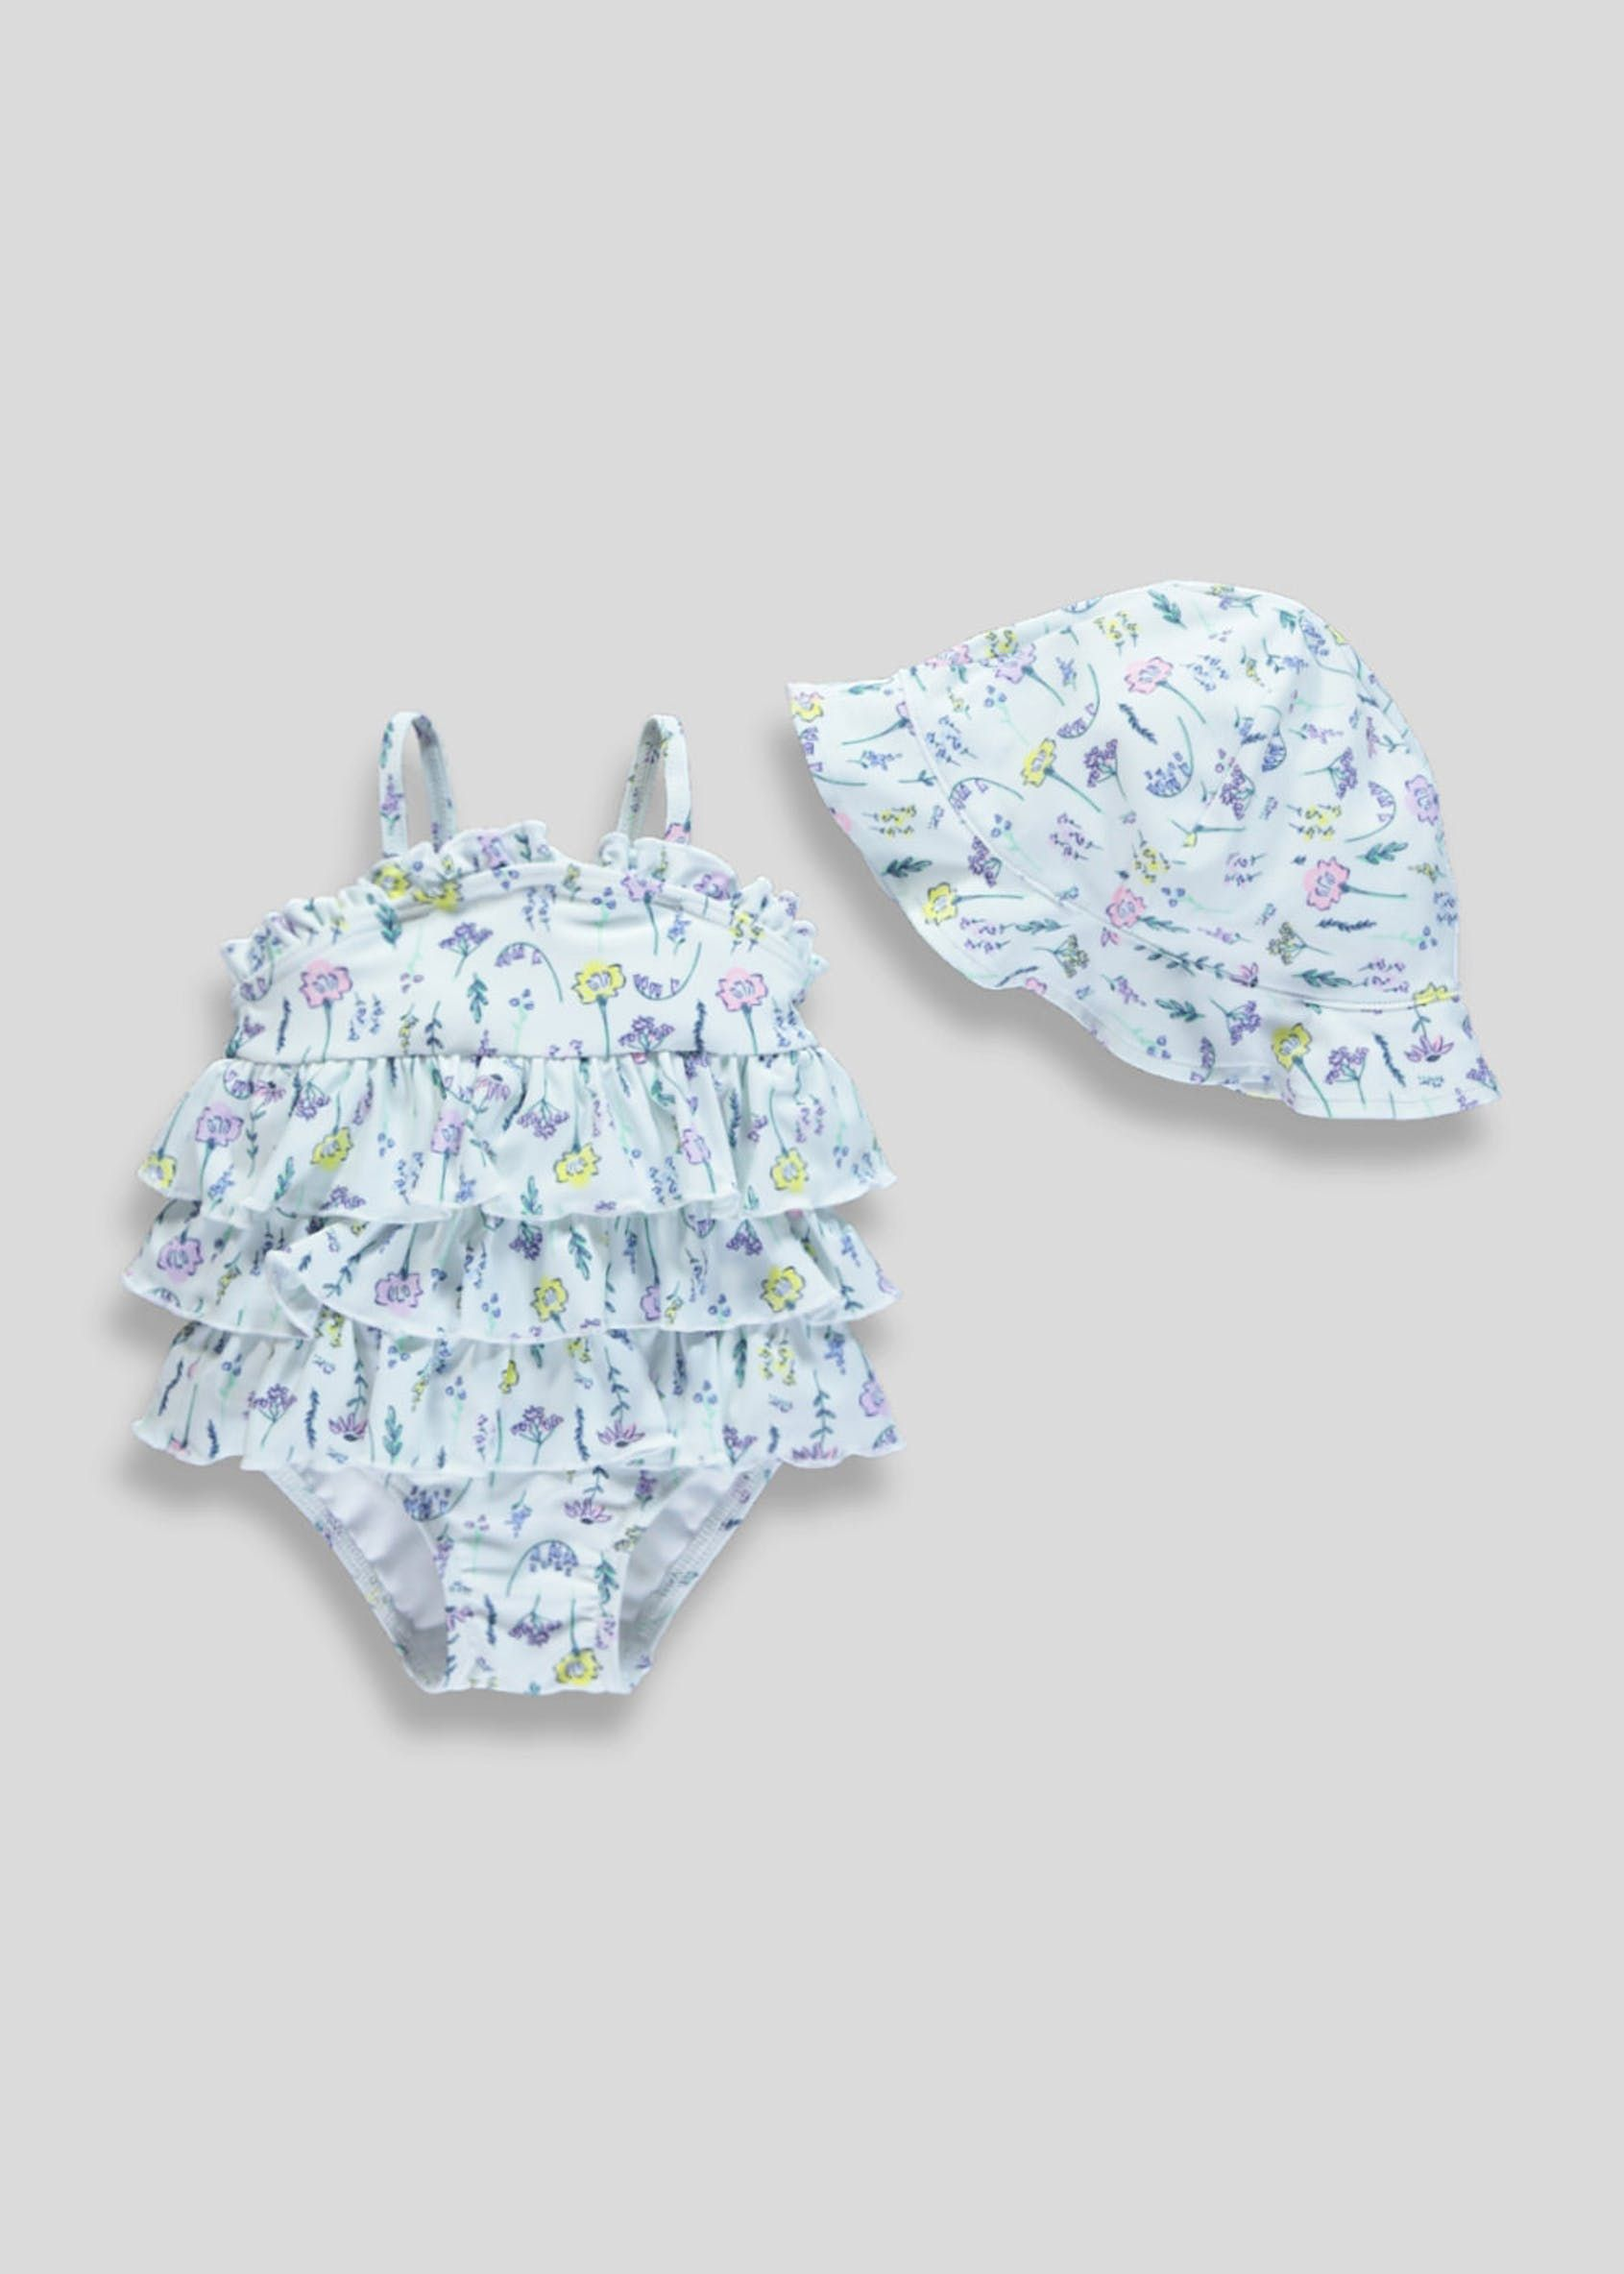 45b065188 Girls Floral Swimming Costume & Swim Hat Set (Newborn-12mths ...